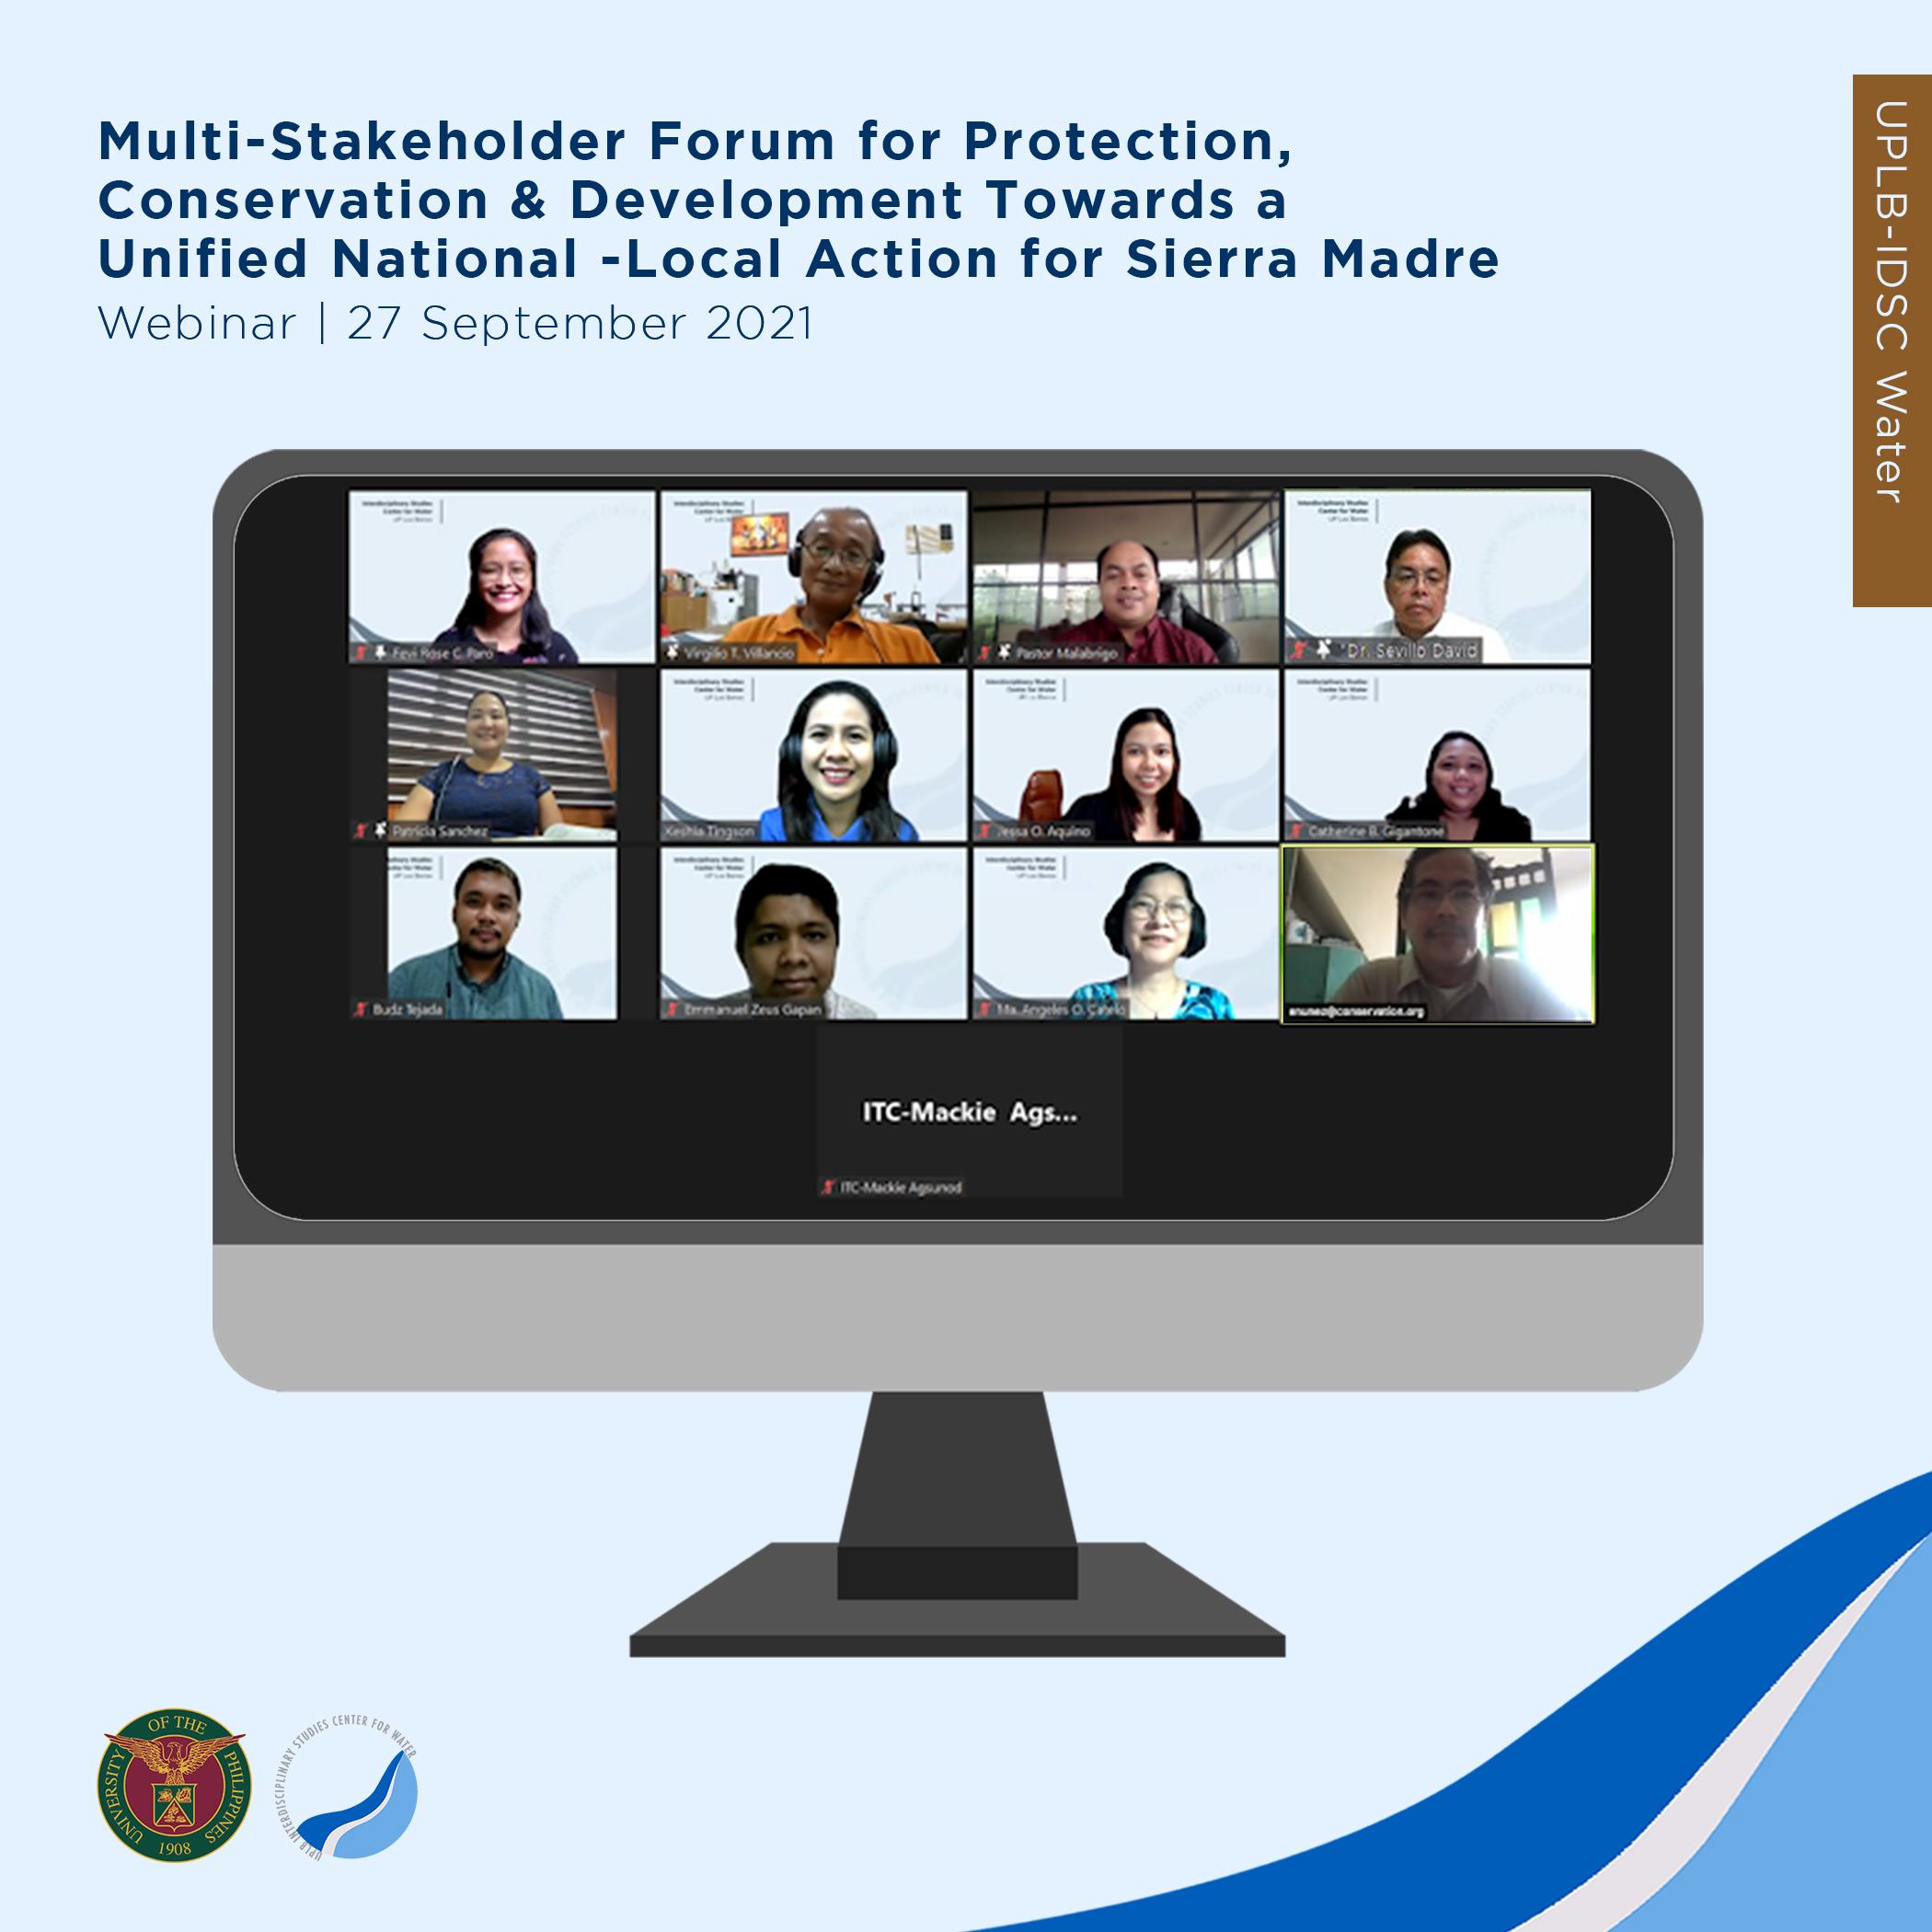 UPLB IDSC WATER celebrates Sierra Madre Day through a Webinar